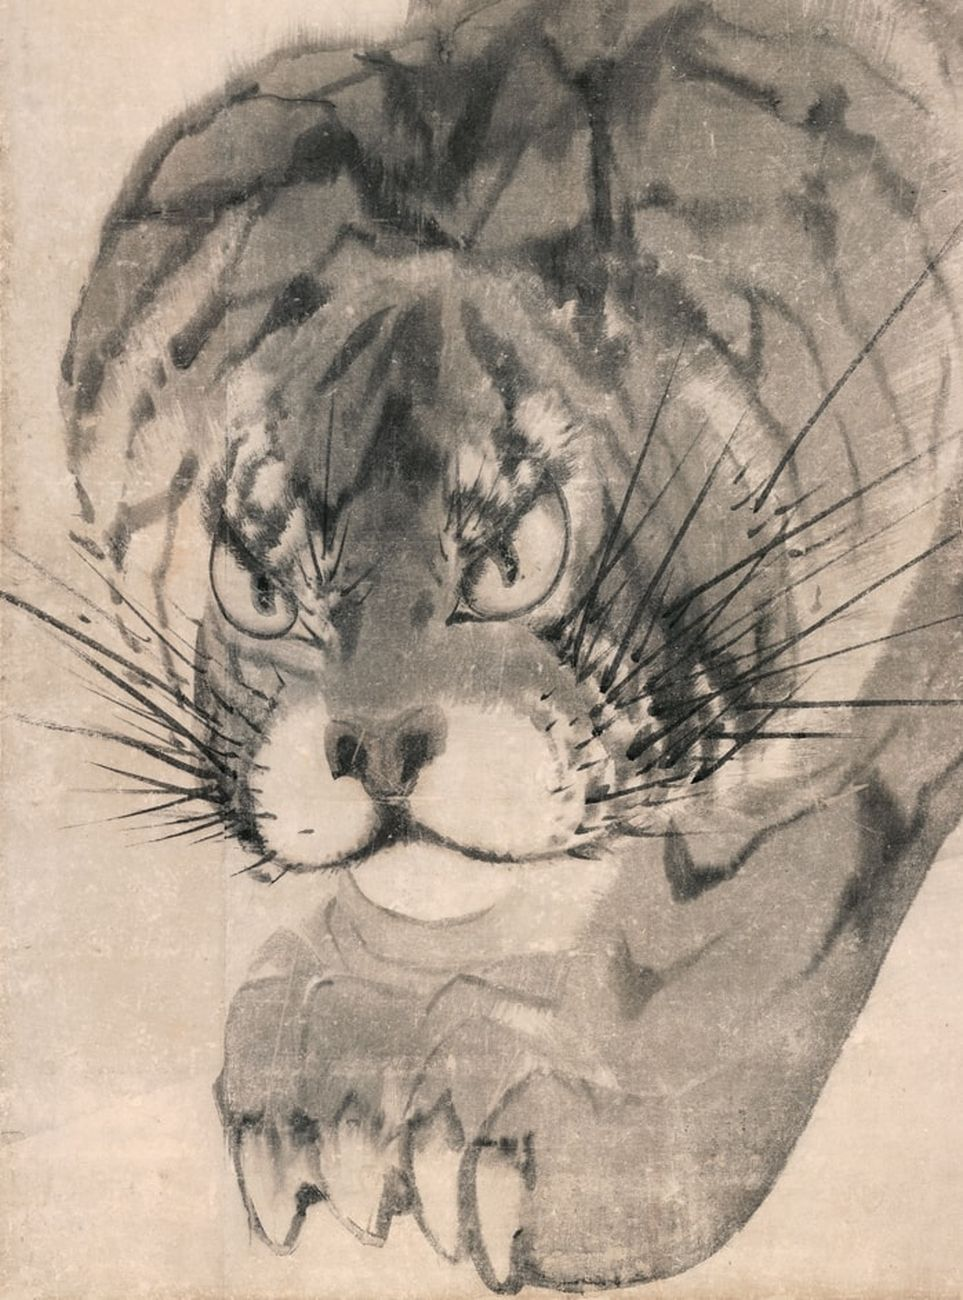 Nagasawa Rosetsu, Tigre, 1786. Dettaglio da una serie di 6 pareti mobili, Muryōji, Kushimoto